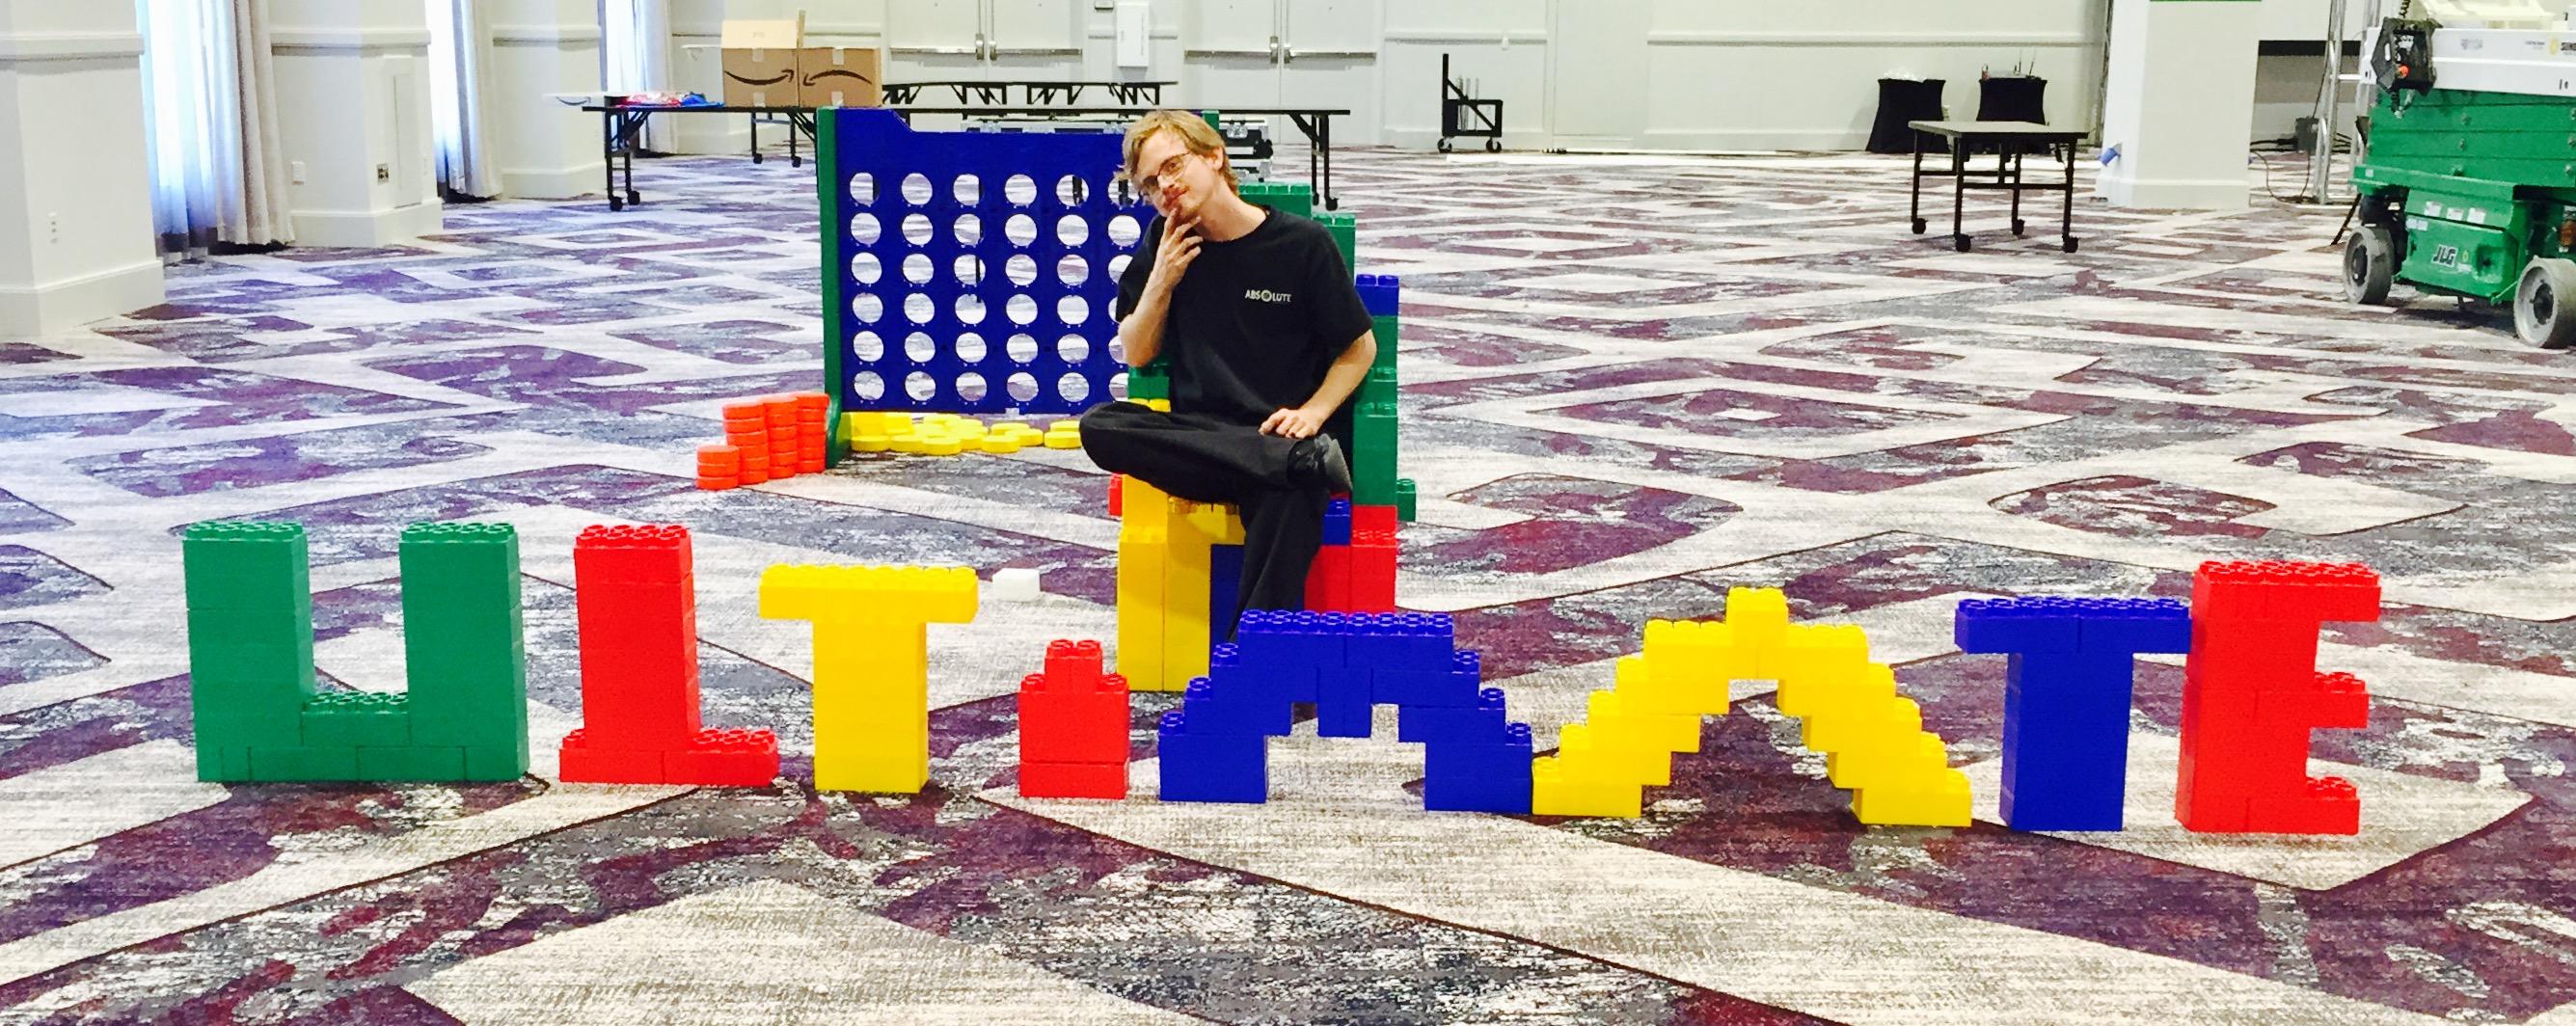 Giant Lego Photo Op, Giant Life Size Lego, Giant Building Blocks, Giant Game Rentals